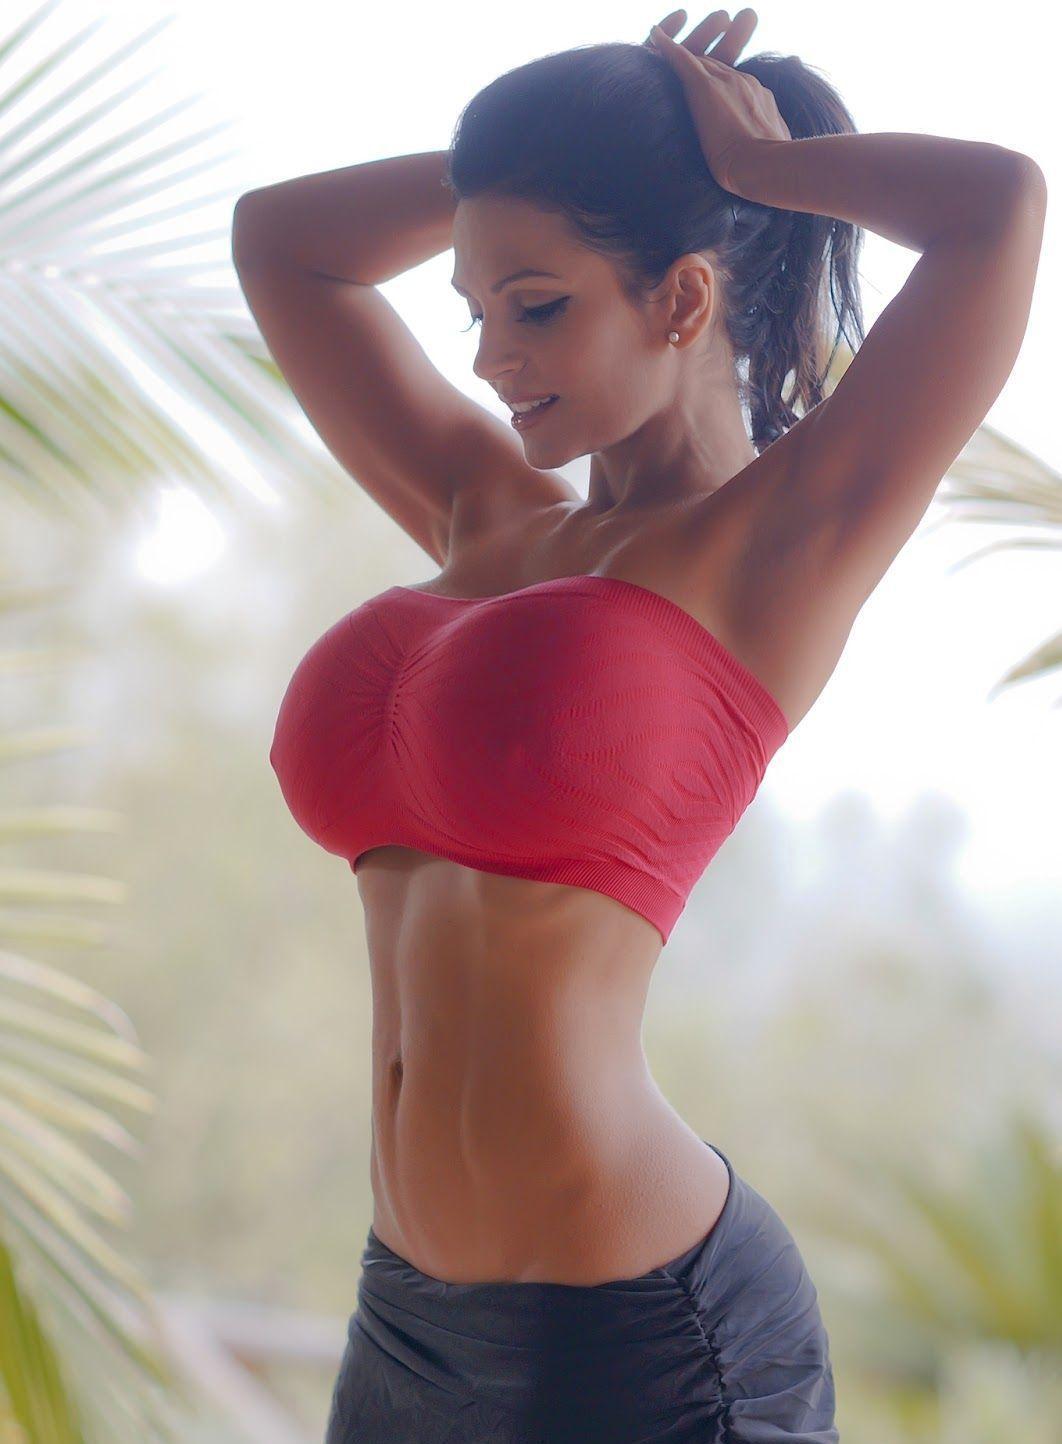 big boobs Fitness Model